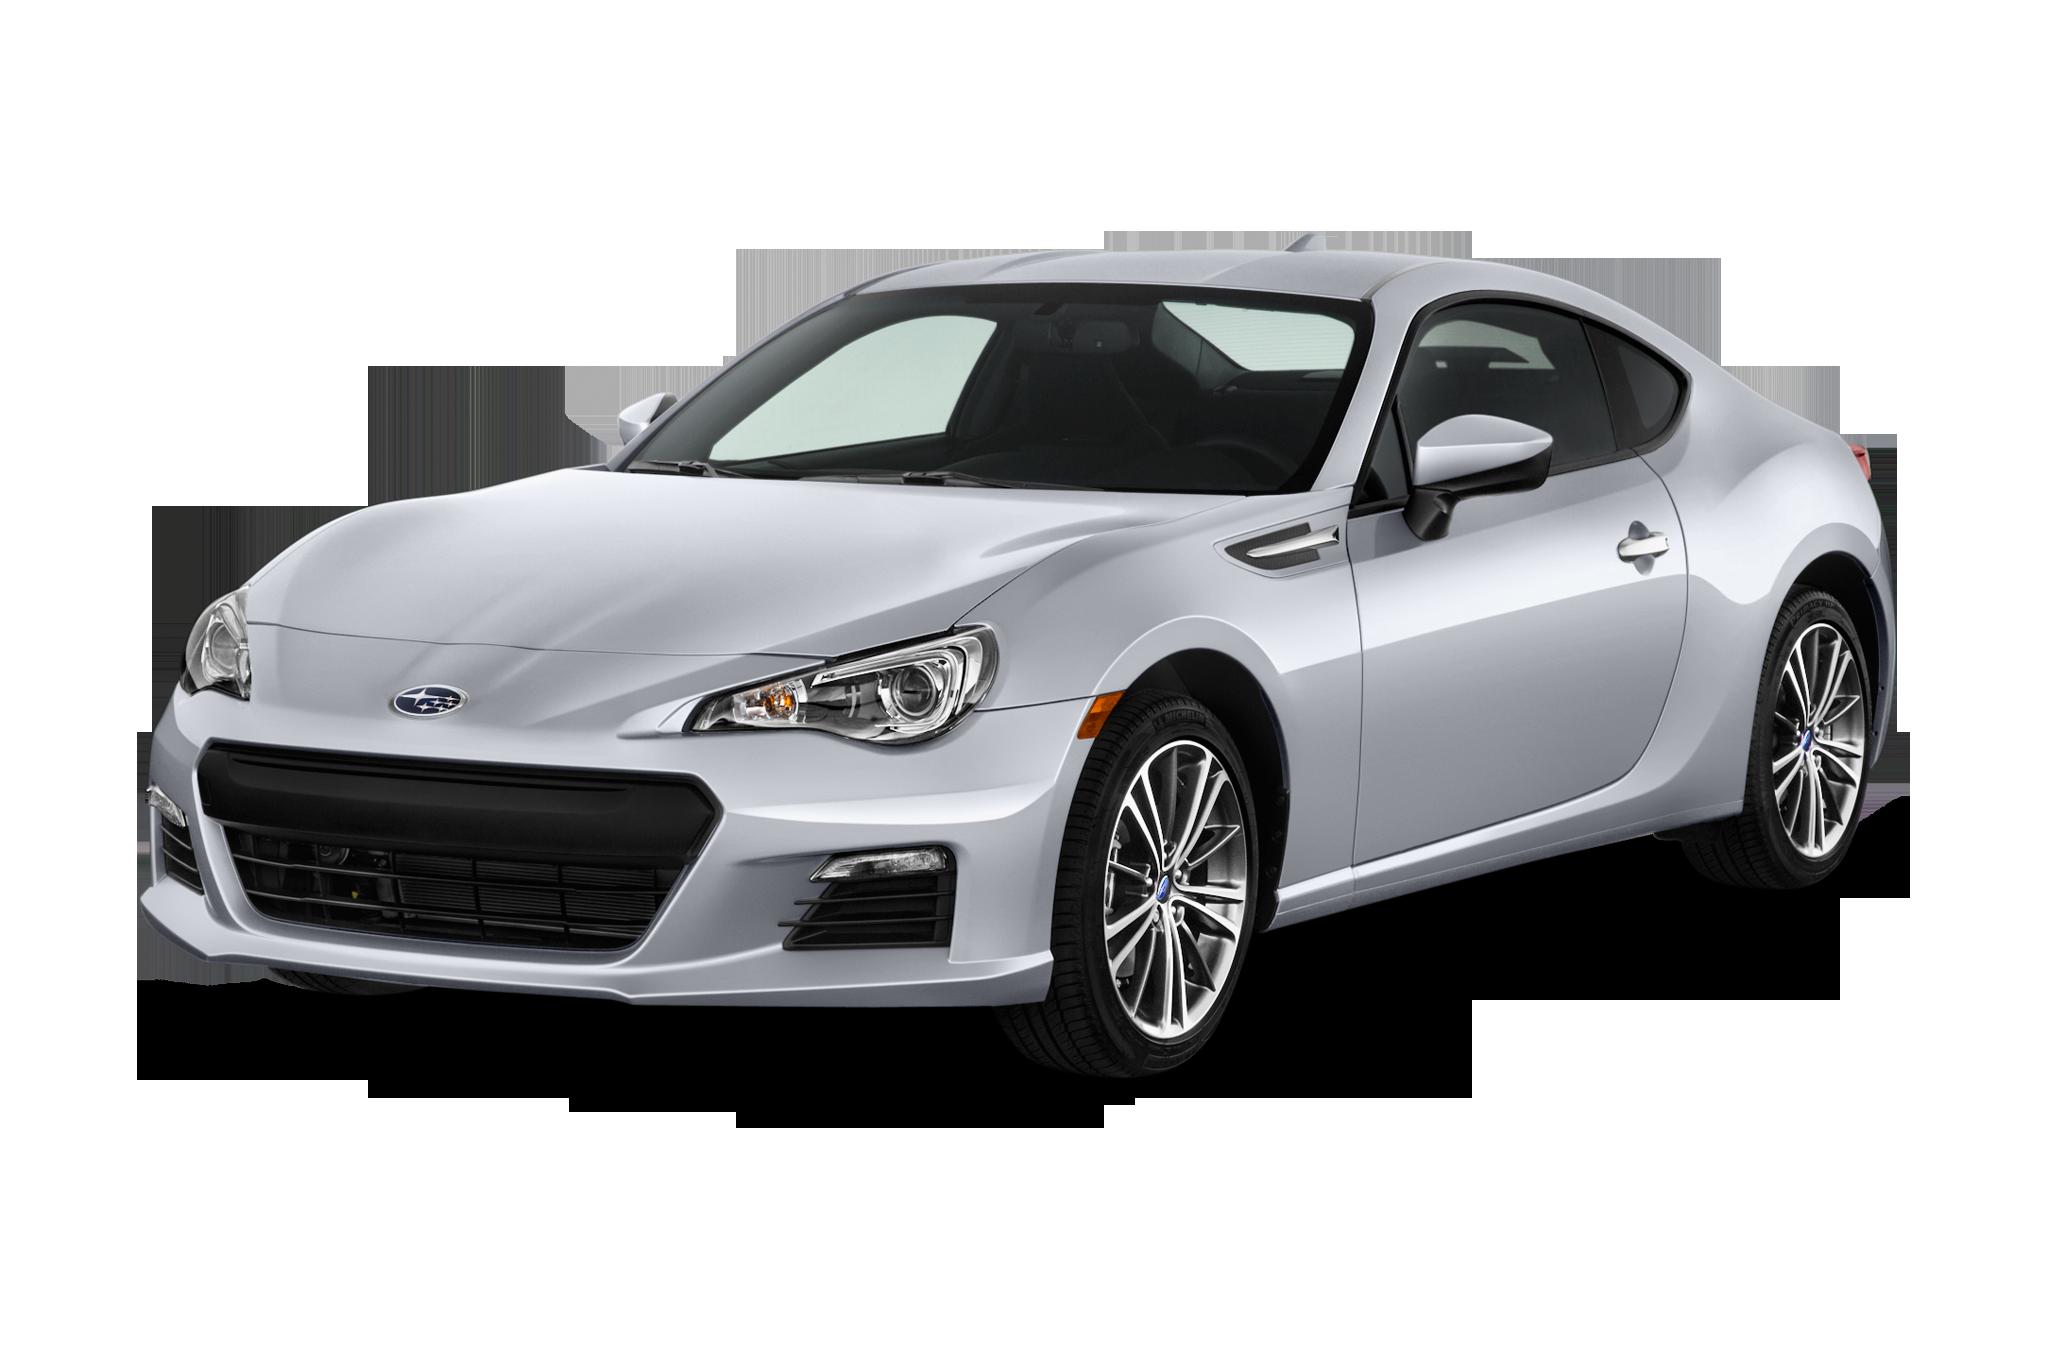 Subaru BRZ 2015 International Price & Overview